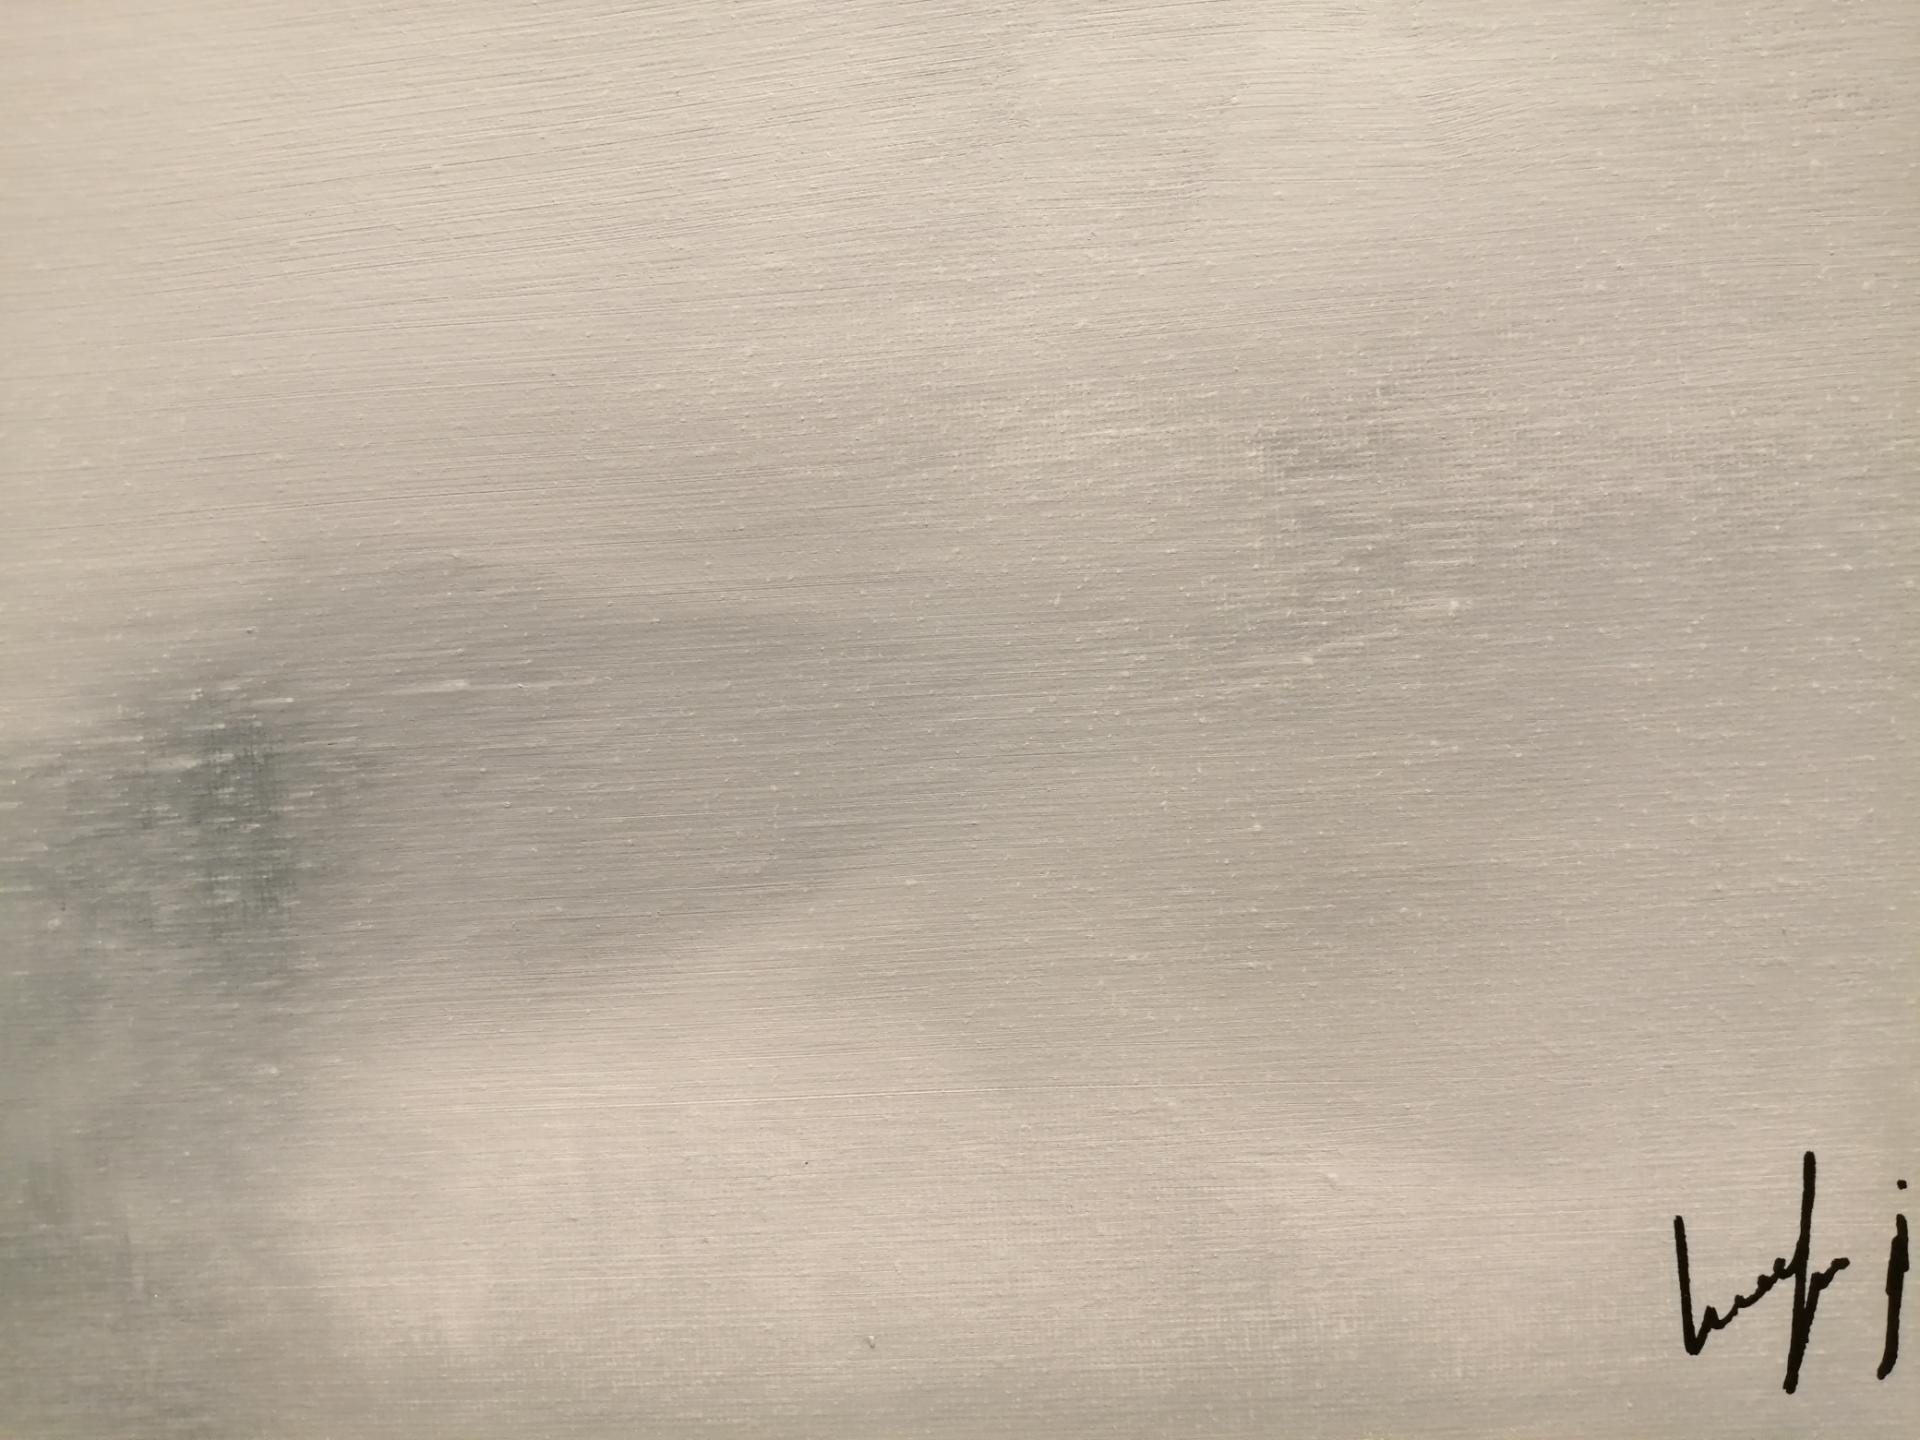 la mer dans la brume